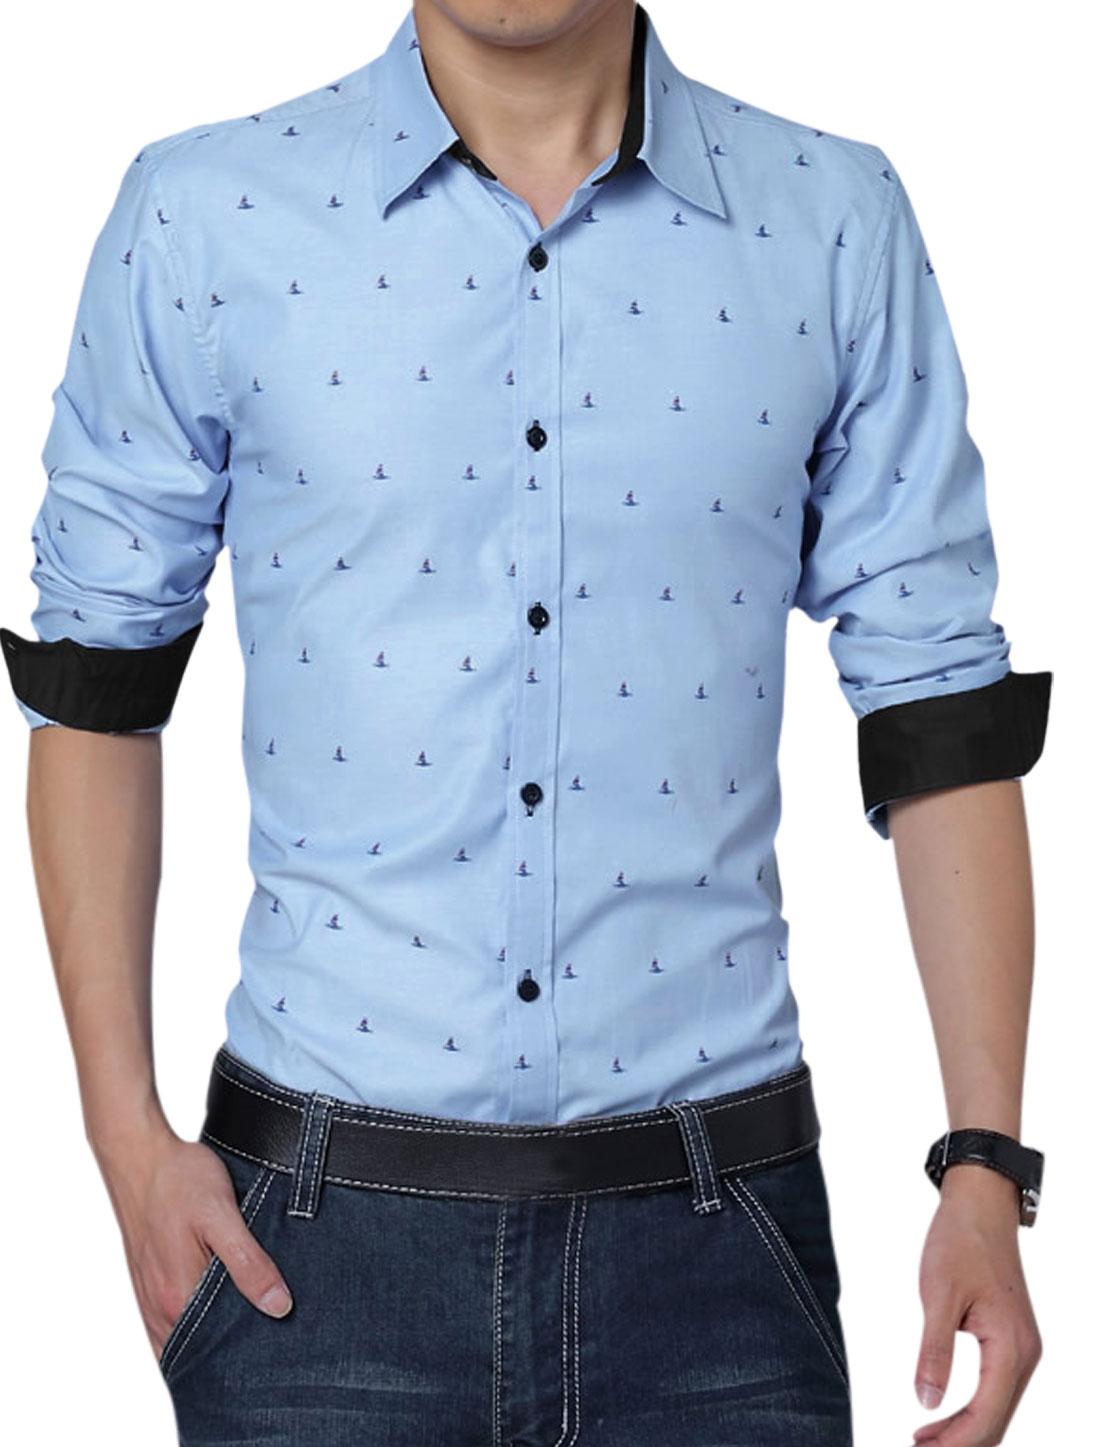 Men Long Sleeve Button Up Novelty Prints Leisure Shirt Sky Blue L